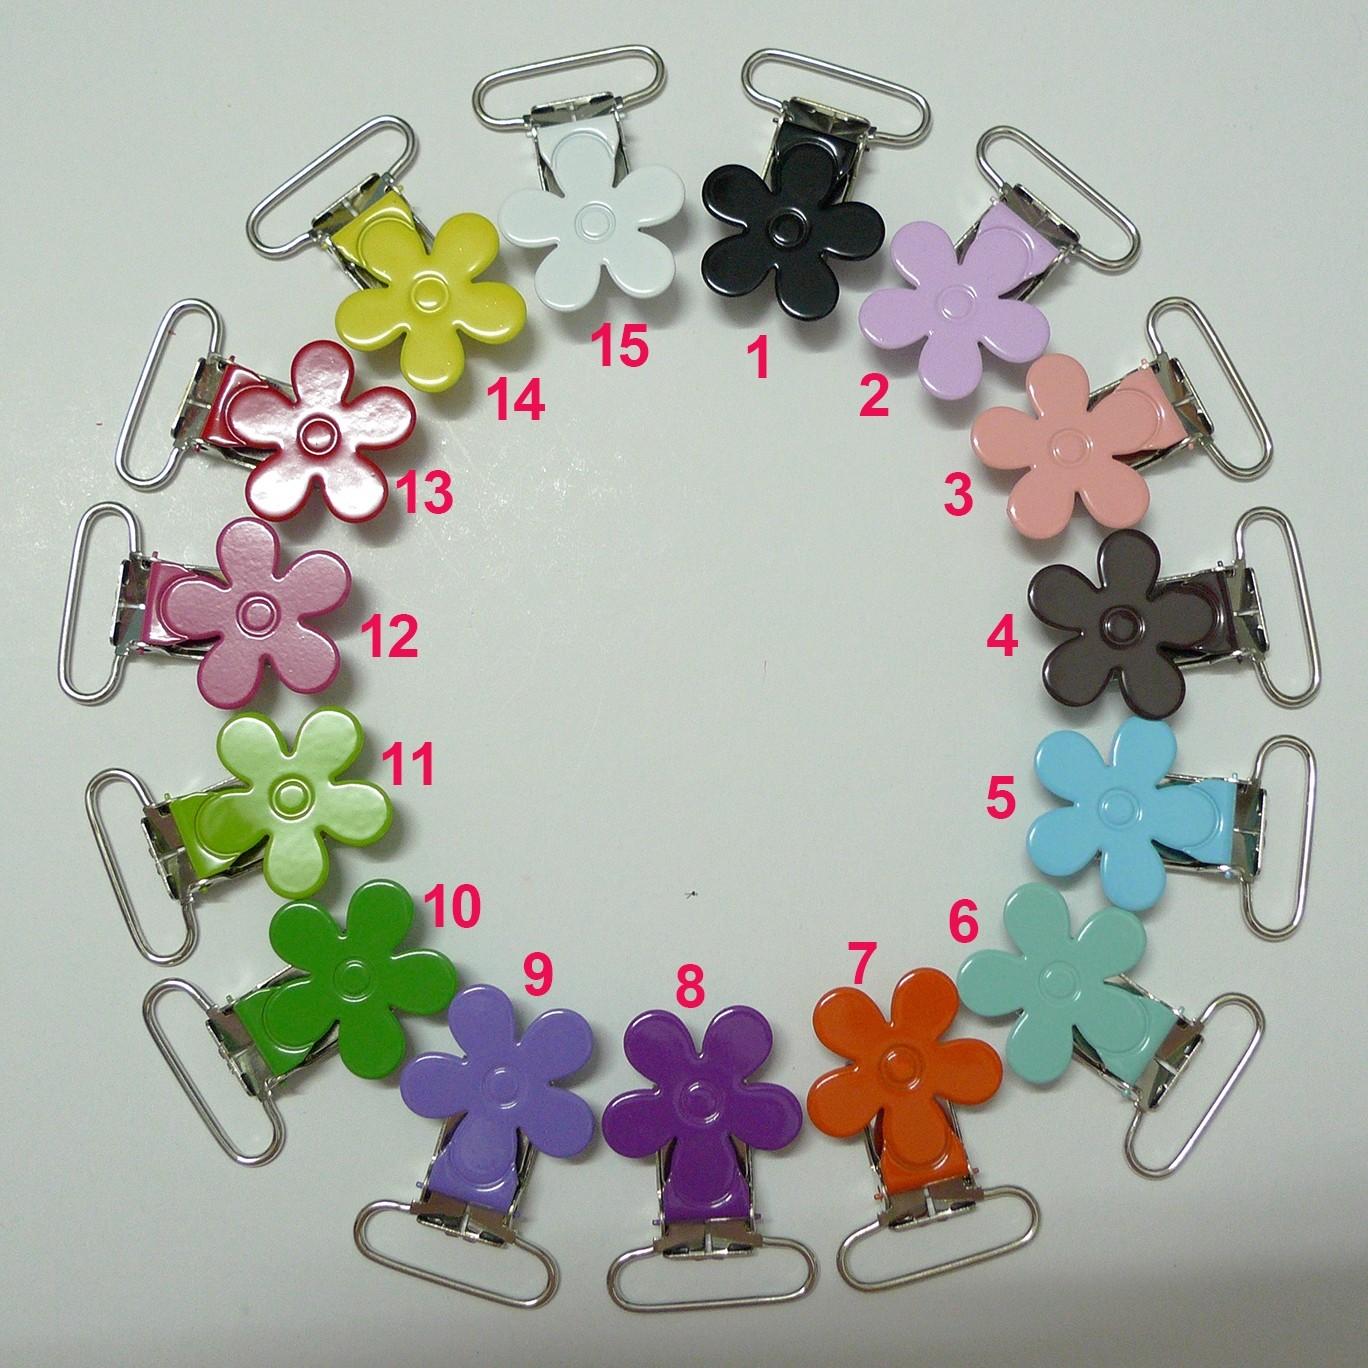 25pcs Flower shape Suspender Clips in yiwu markets